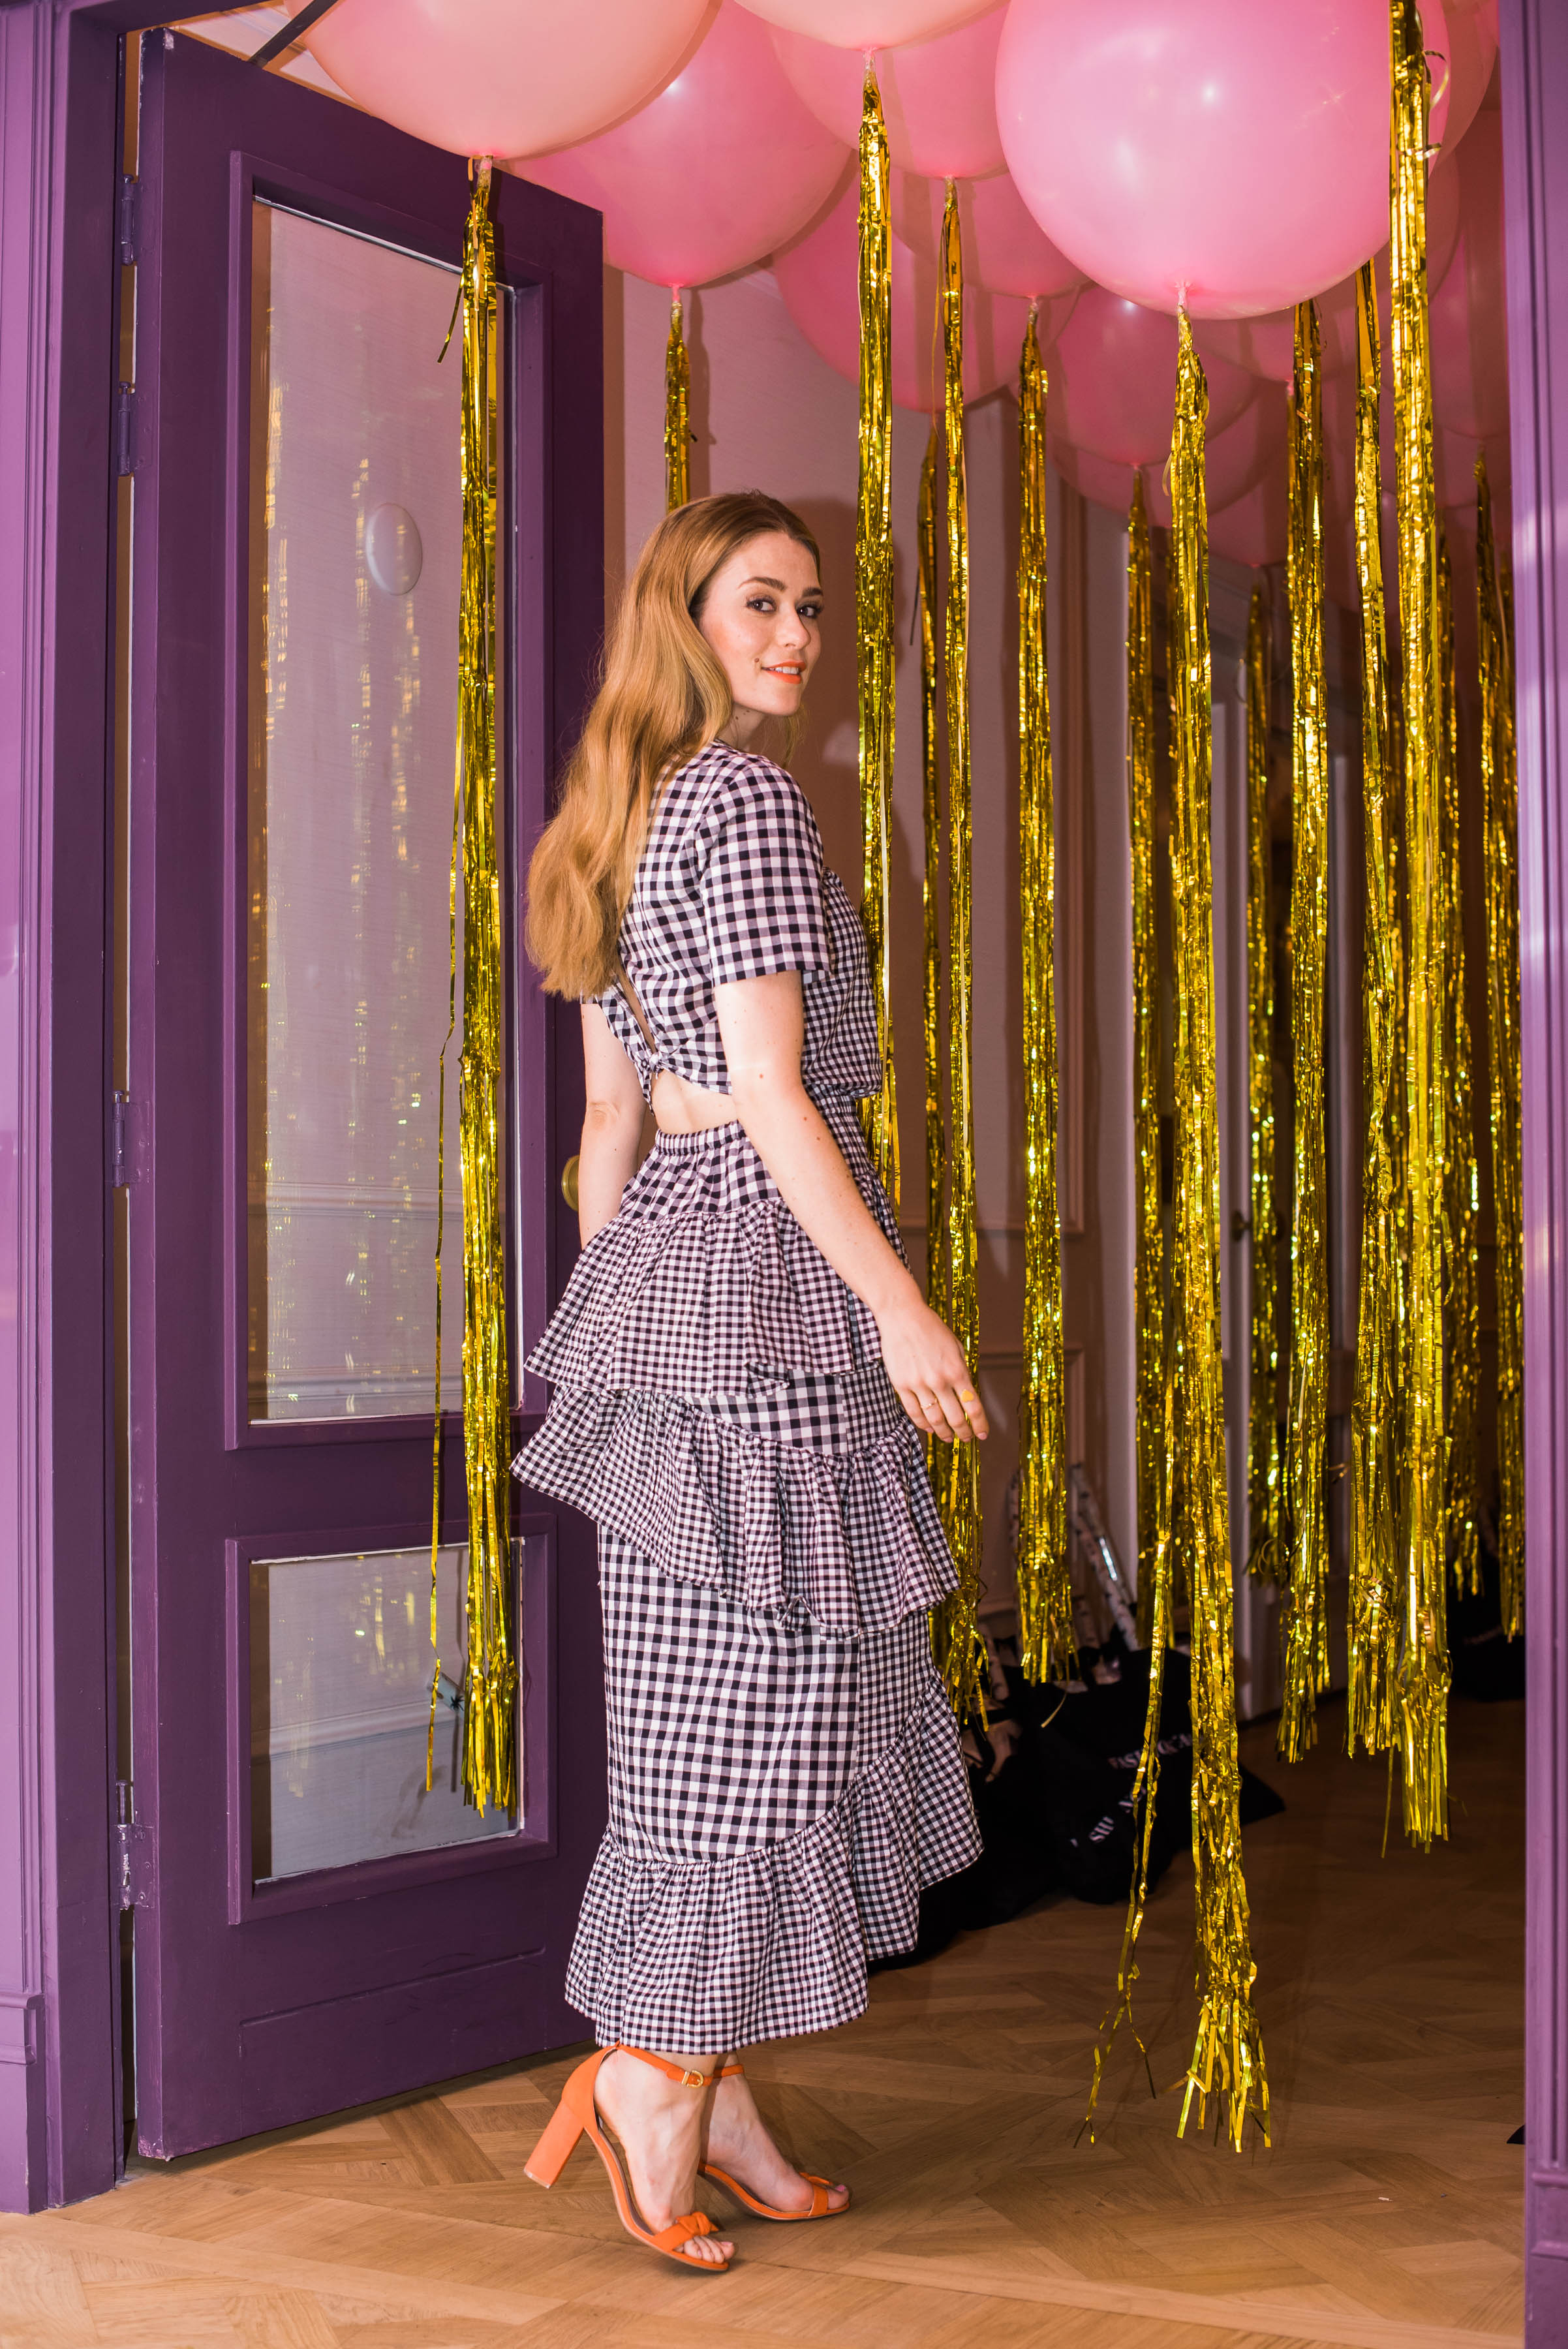 2018-mei-Fashionchick-18.jpg